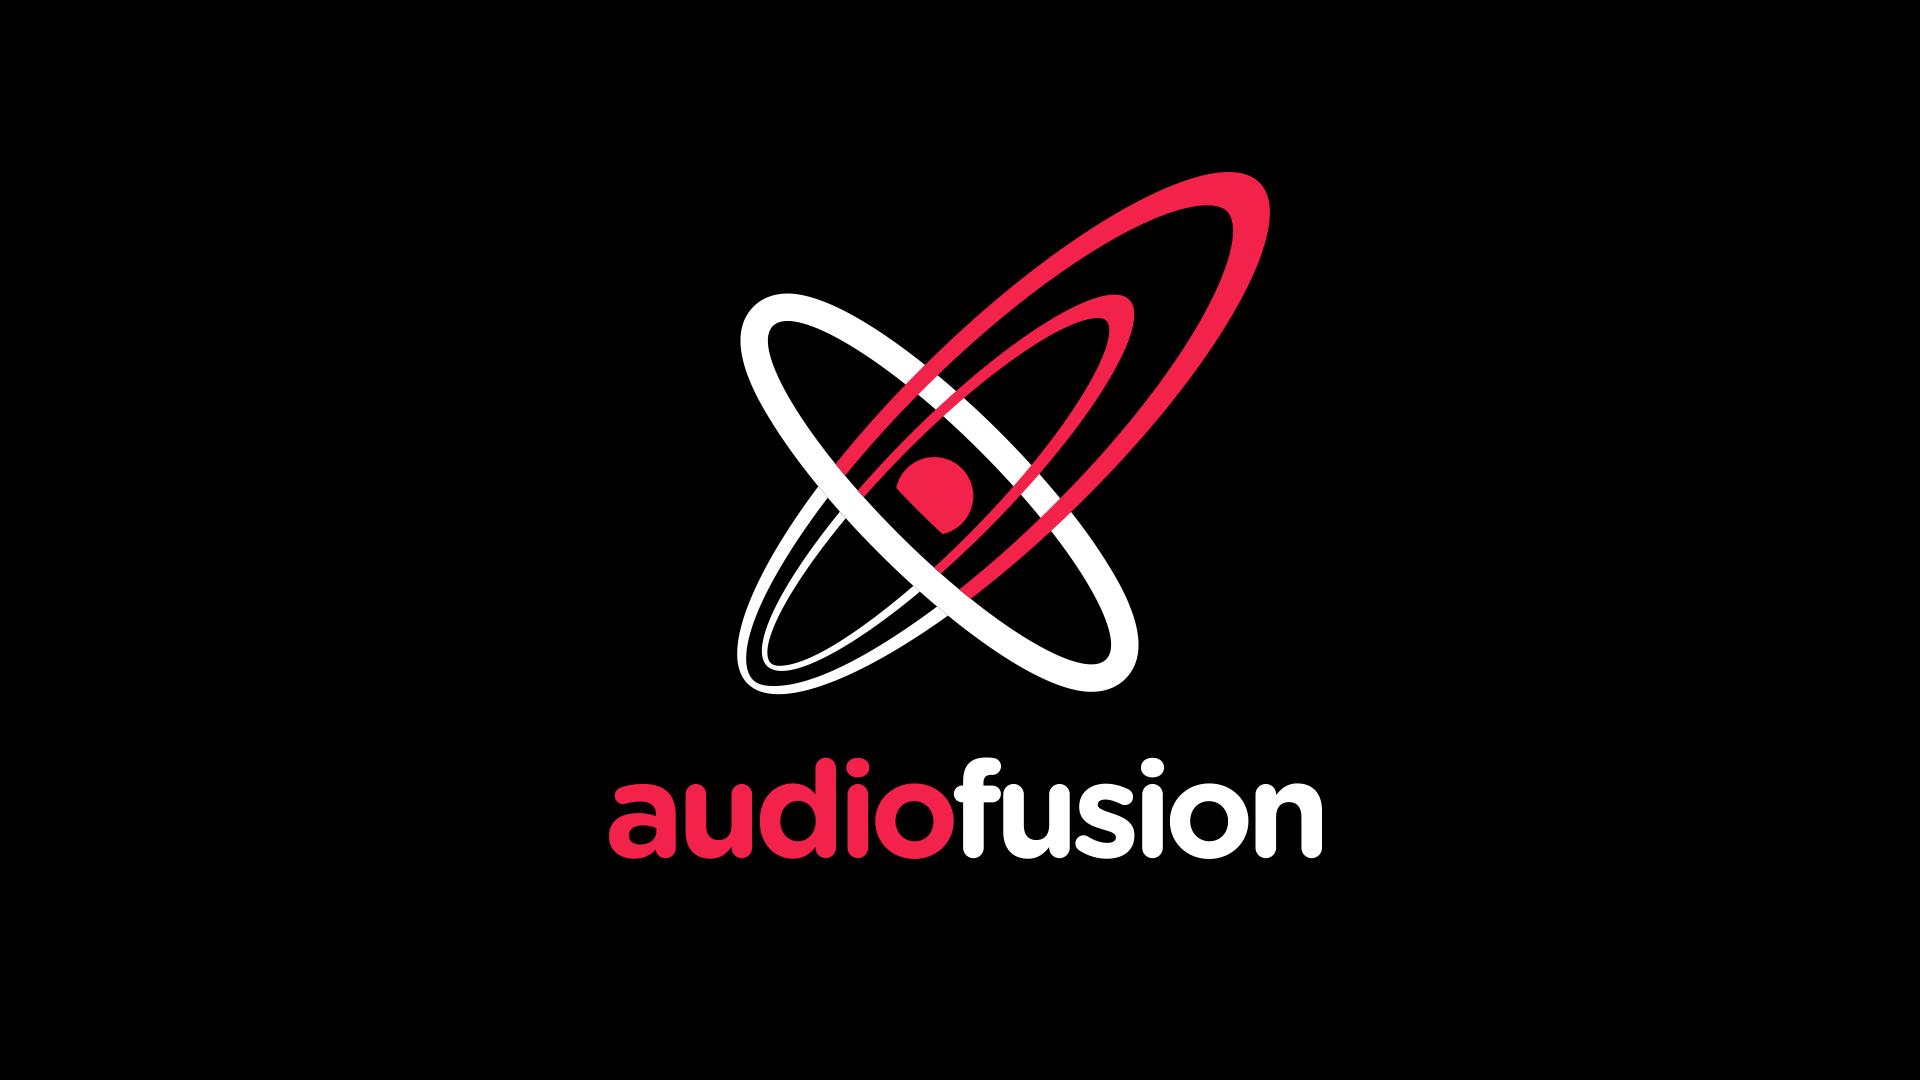 audioFusion_branding_portfolio_.002.png